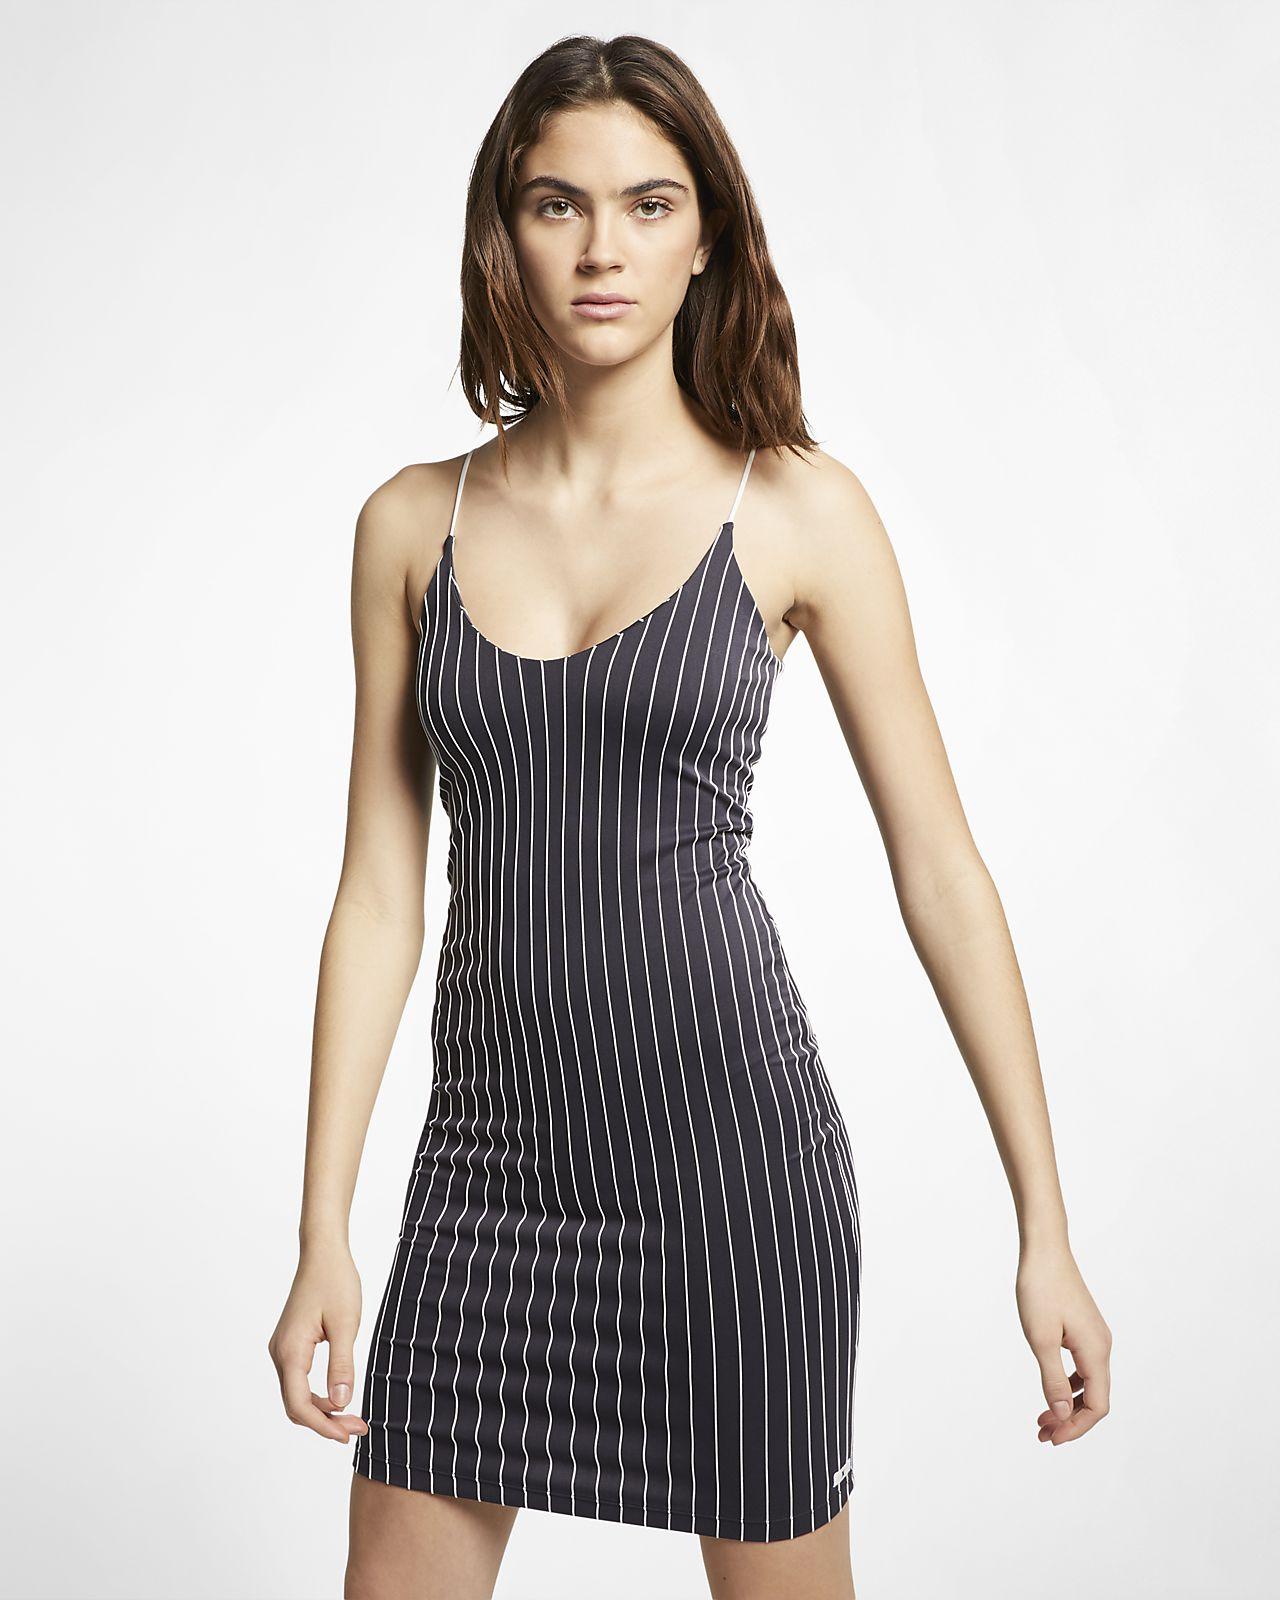 Hurley Quick Dry Rise Women's Dress